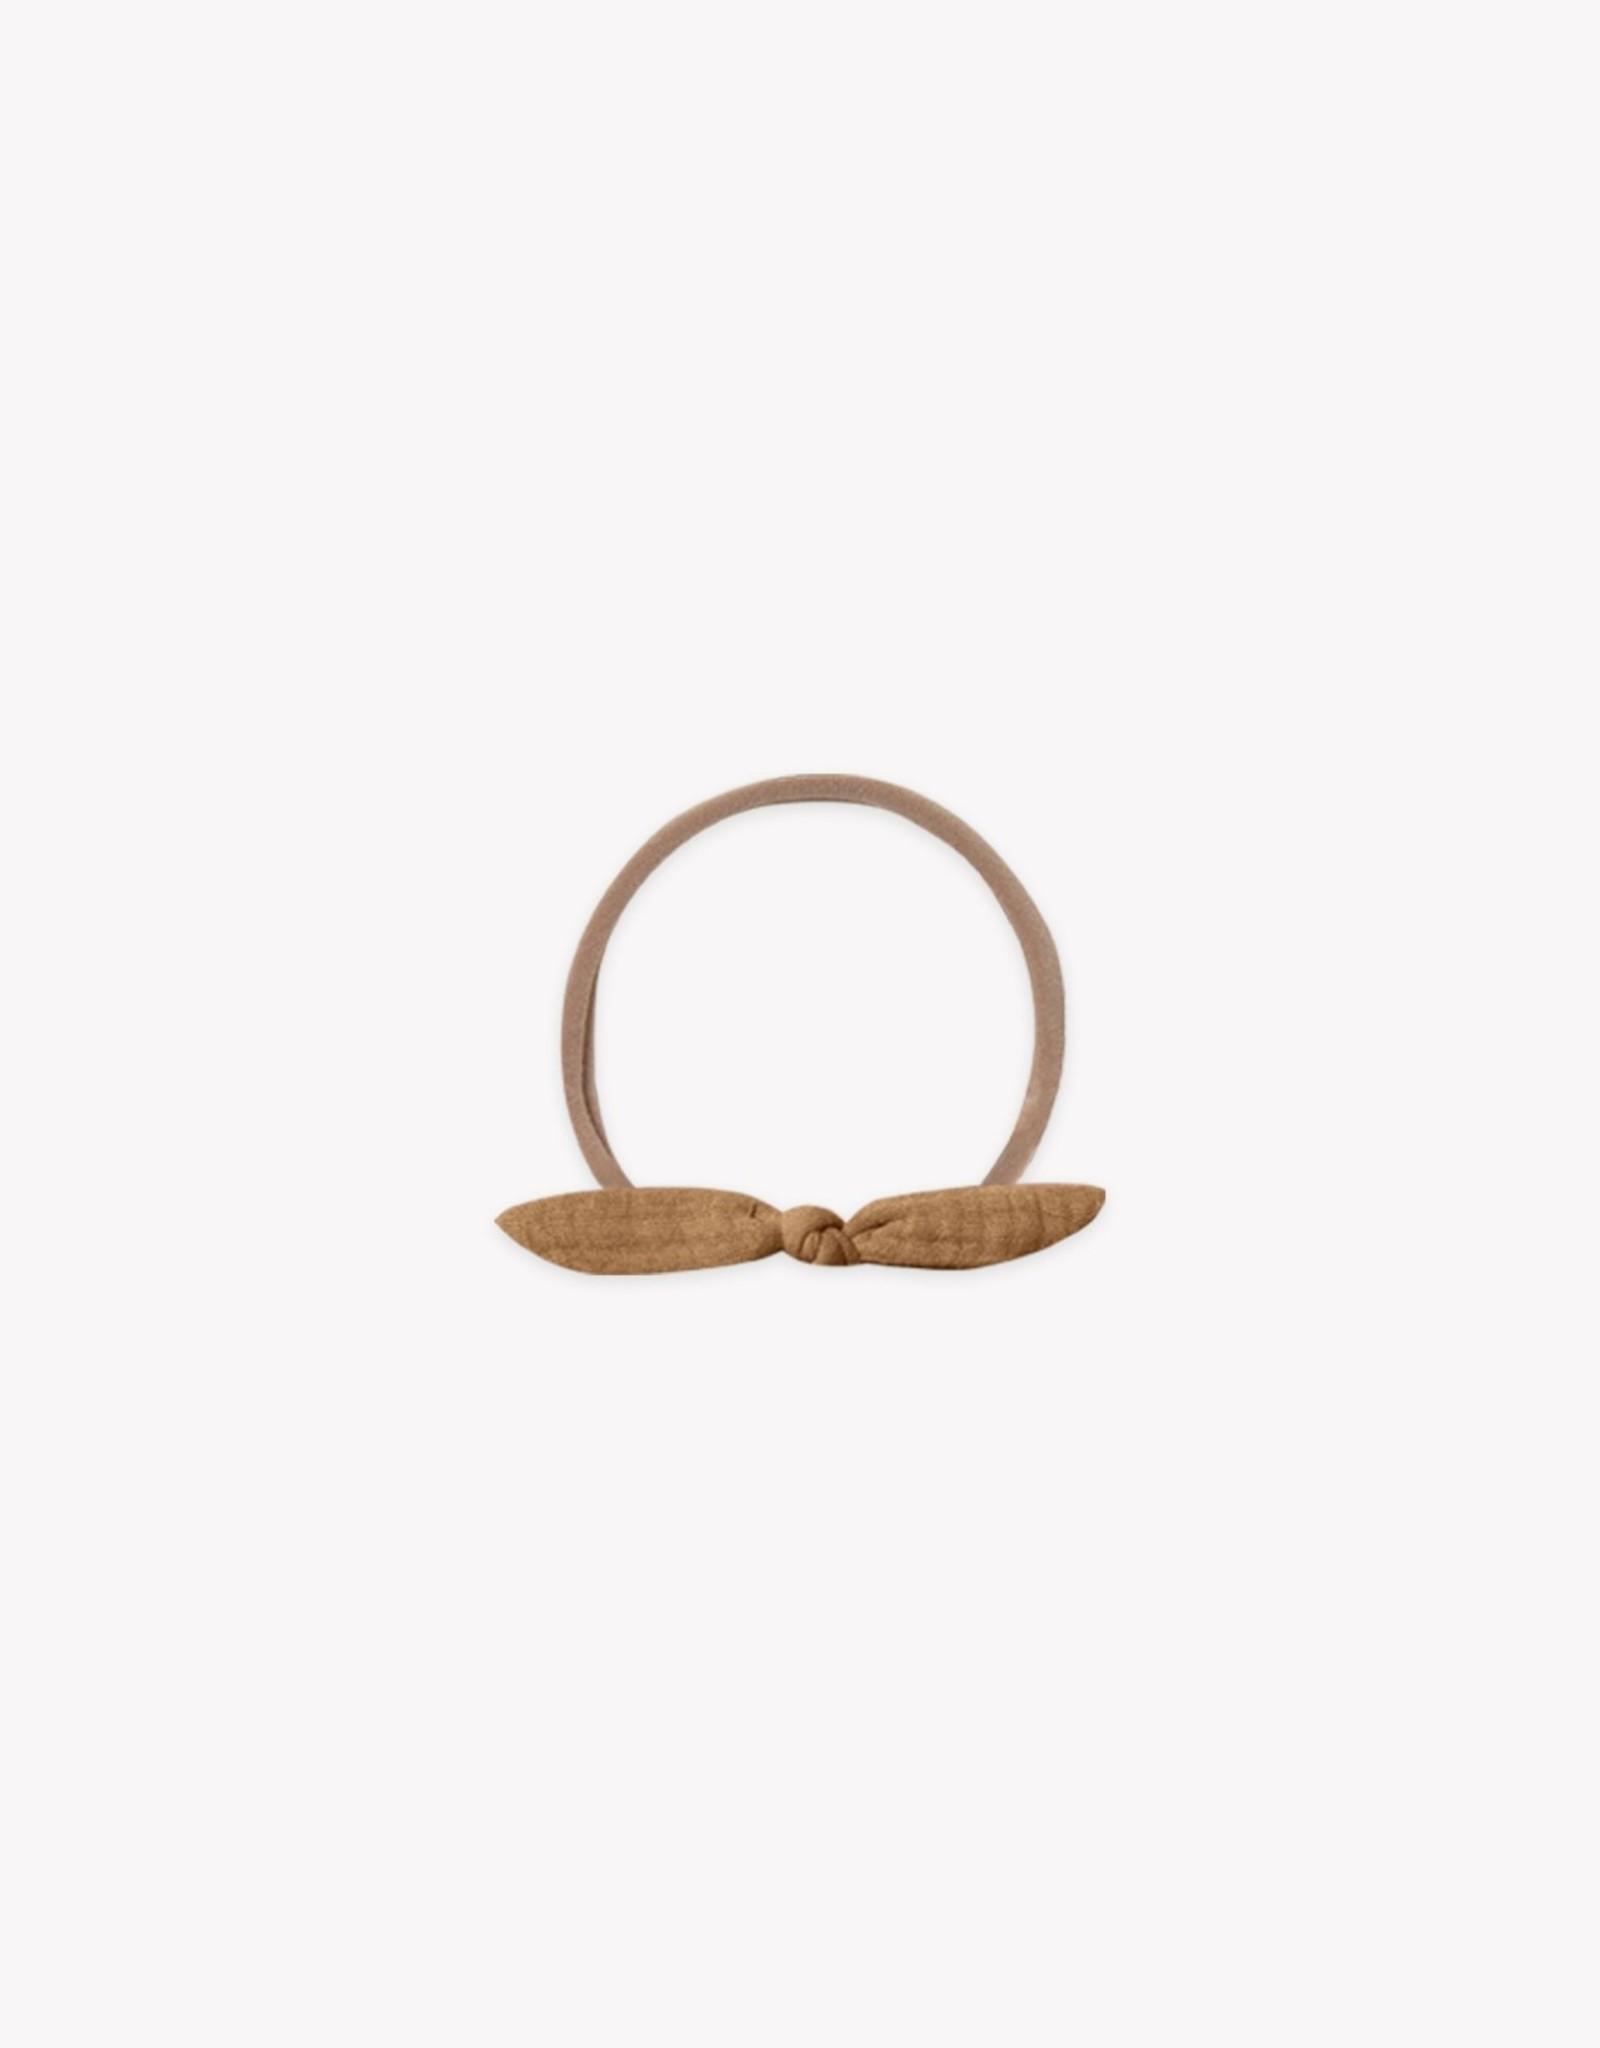 Quincy Mae Quincy Mae Little Knot Headband